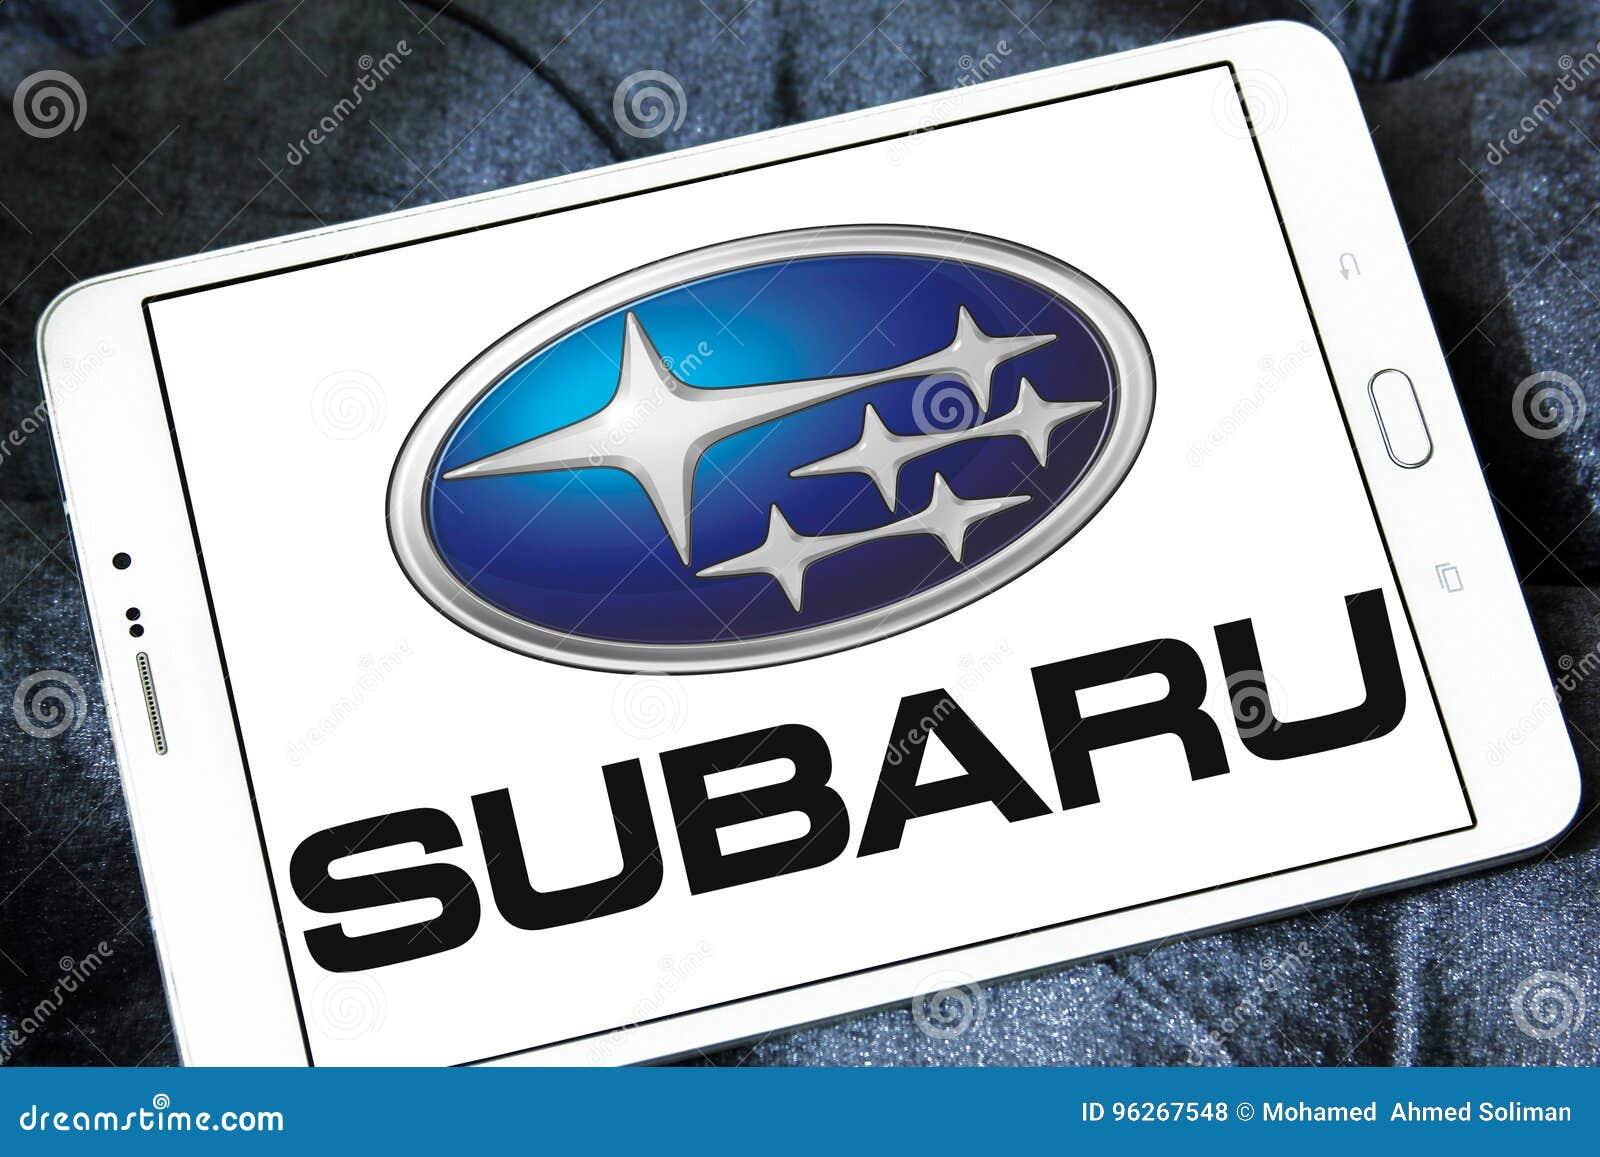 Subaru Car Logo Editorial Stock Photo Image Of Logo 96267548